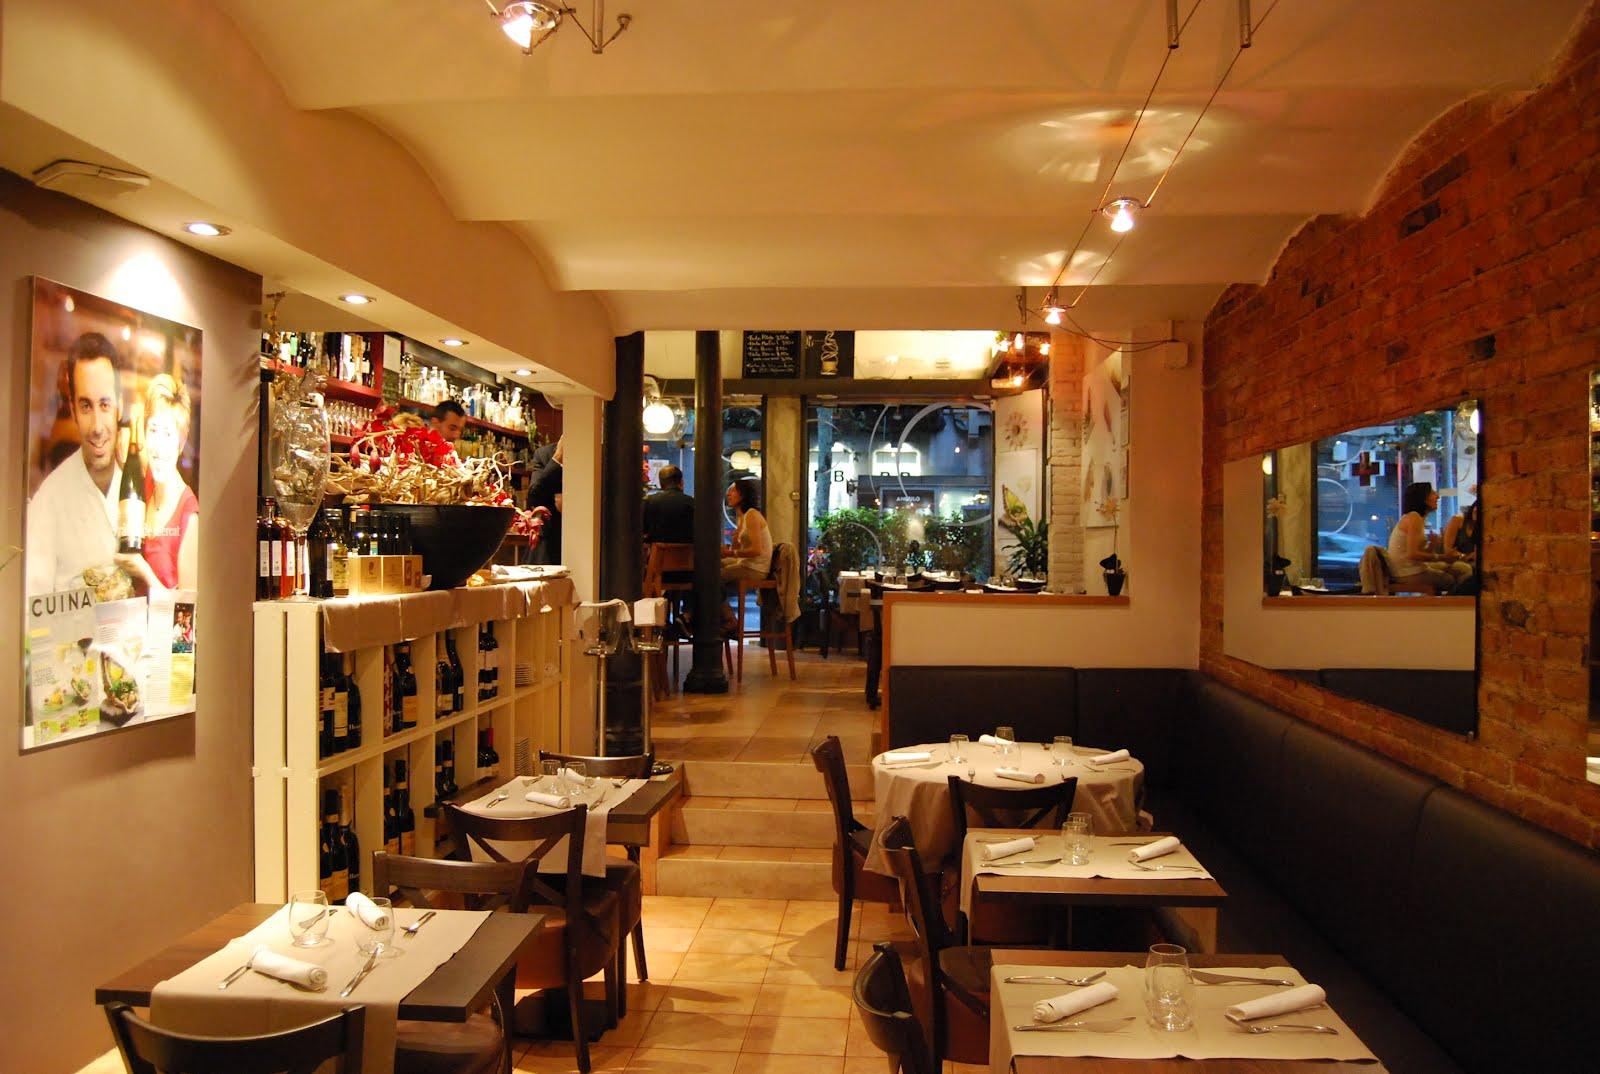 Topik, restaurante, coctel, Madrid, acojonante, 2016, noche, amigos salir, copa, copas, moda, fiesta